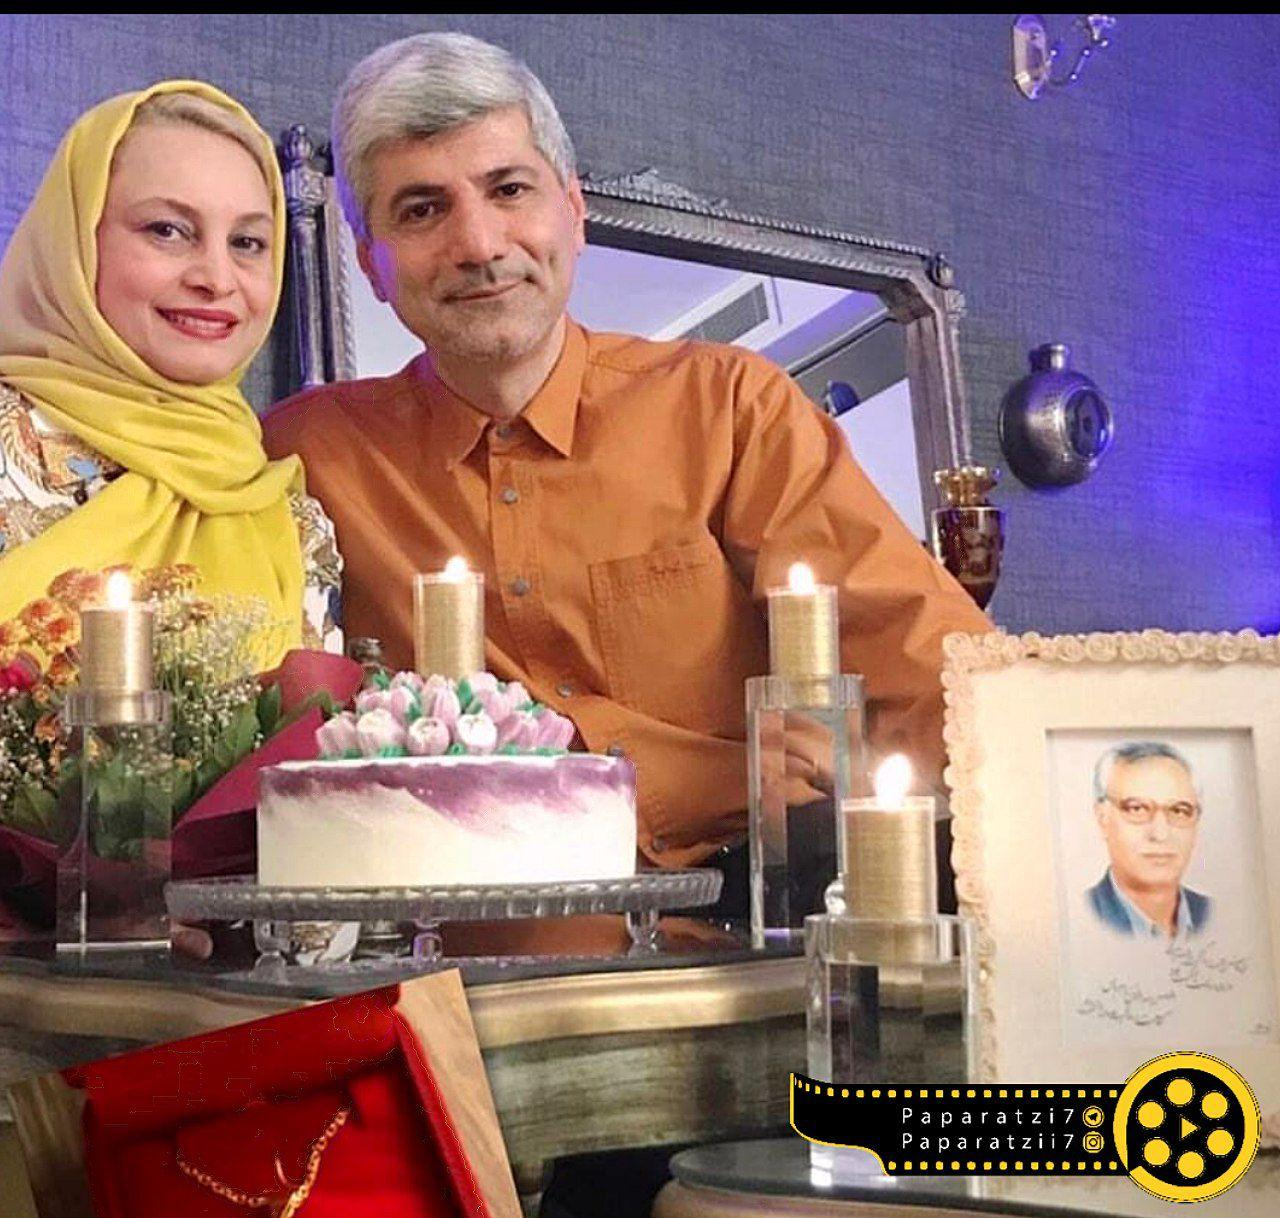 تولد ۵۰ سالگی مریم کاویانی کنار همسر سیاستمدارش +عکس